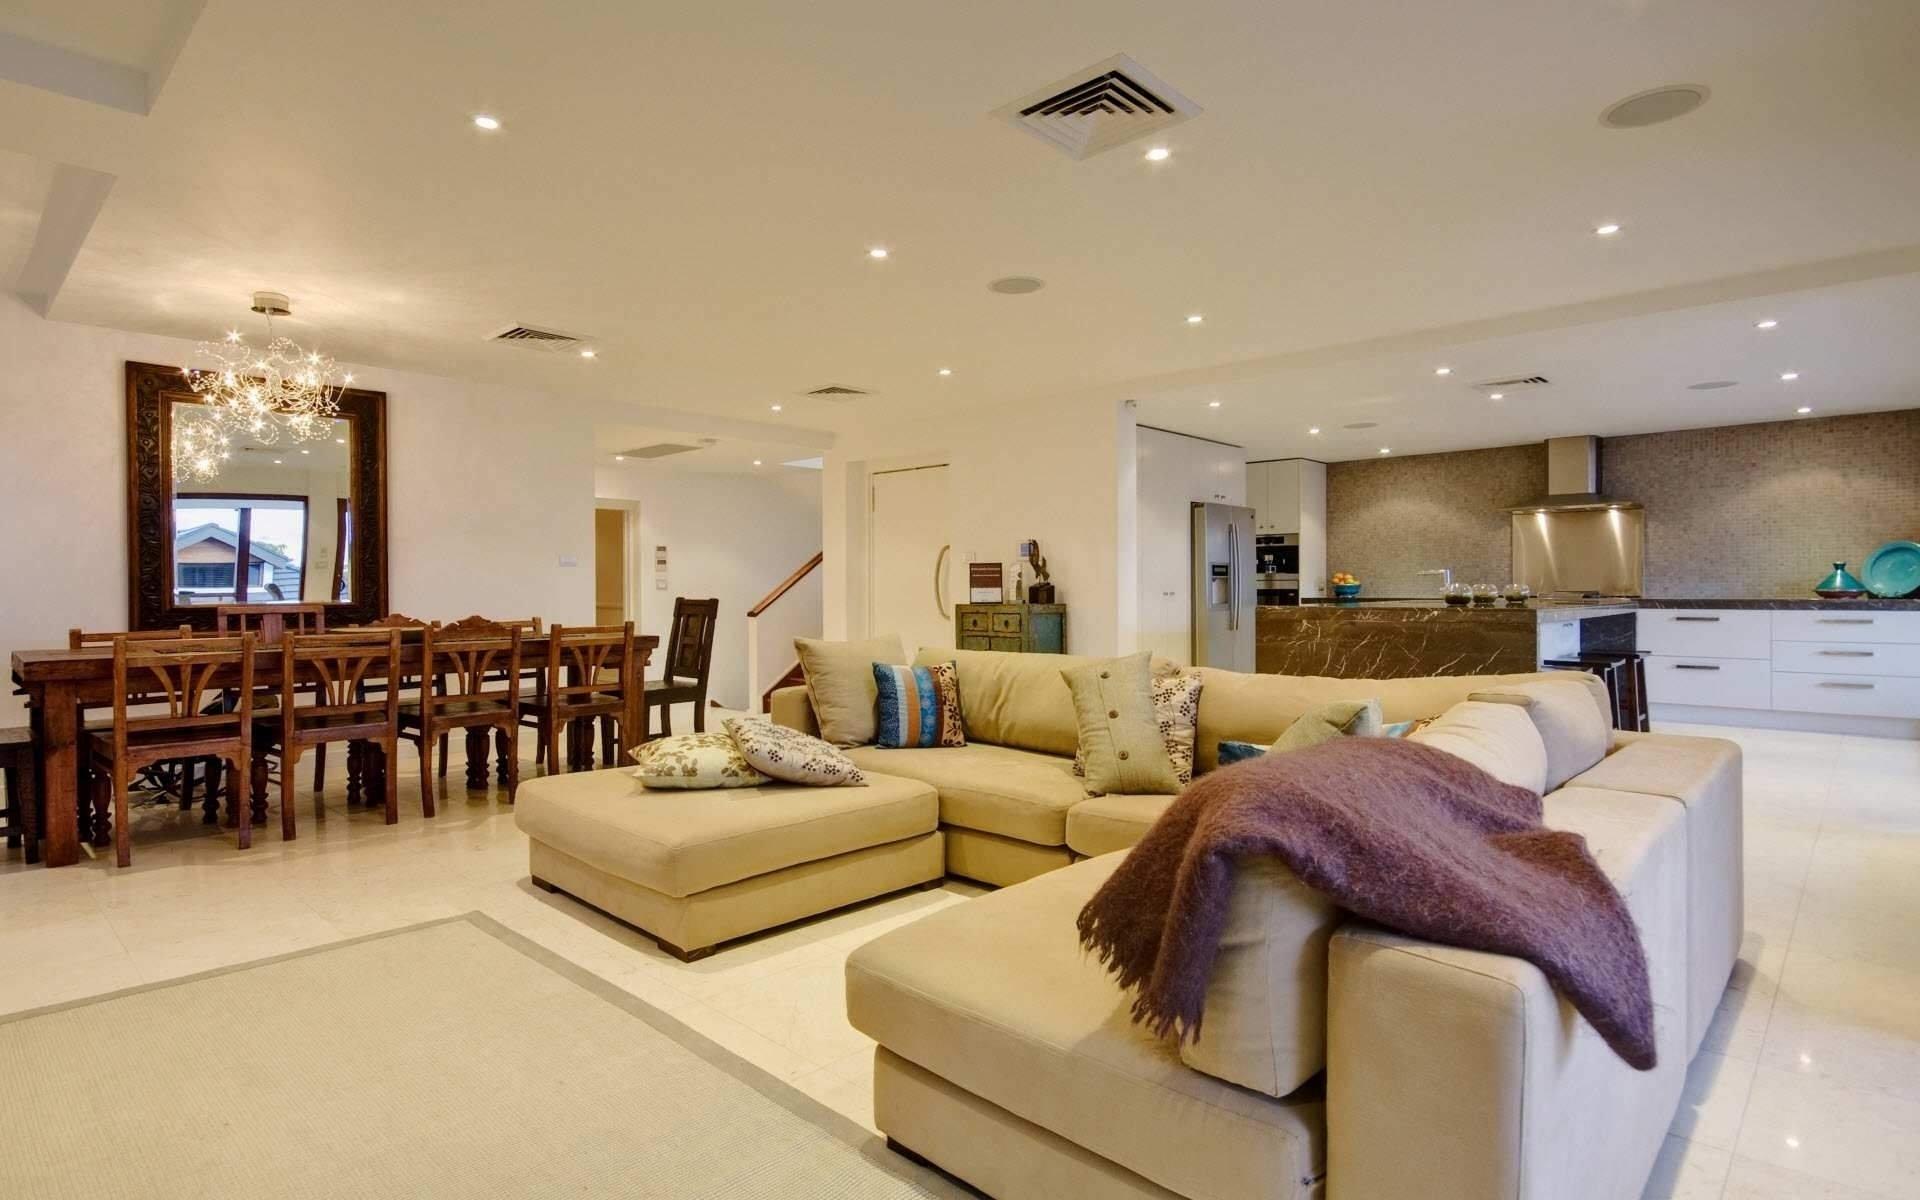 10 Elegant Large Living Room Design Ideas large living room multi family house interior design decobizz 2021